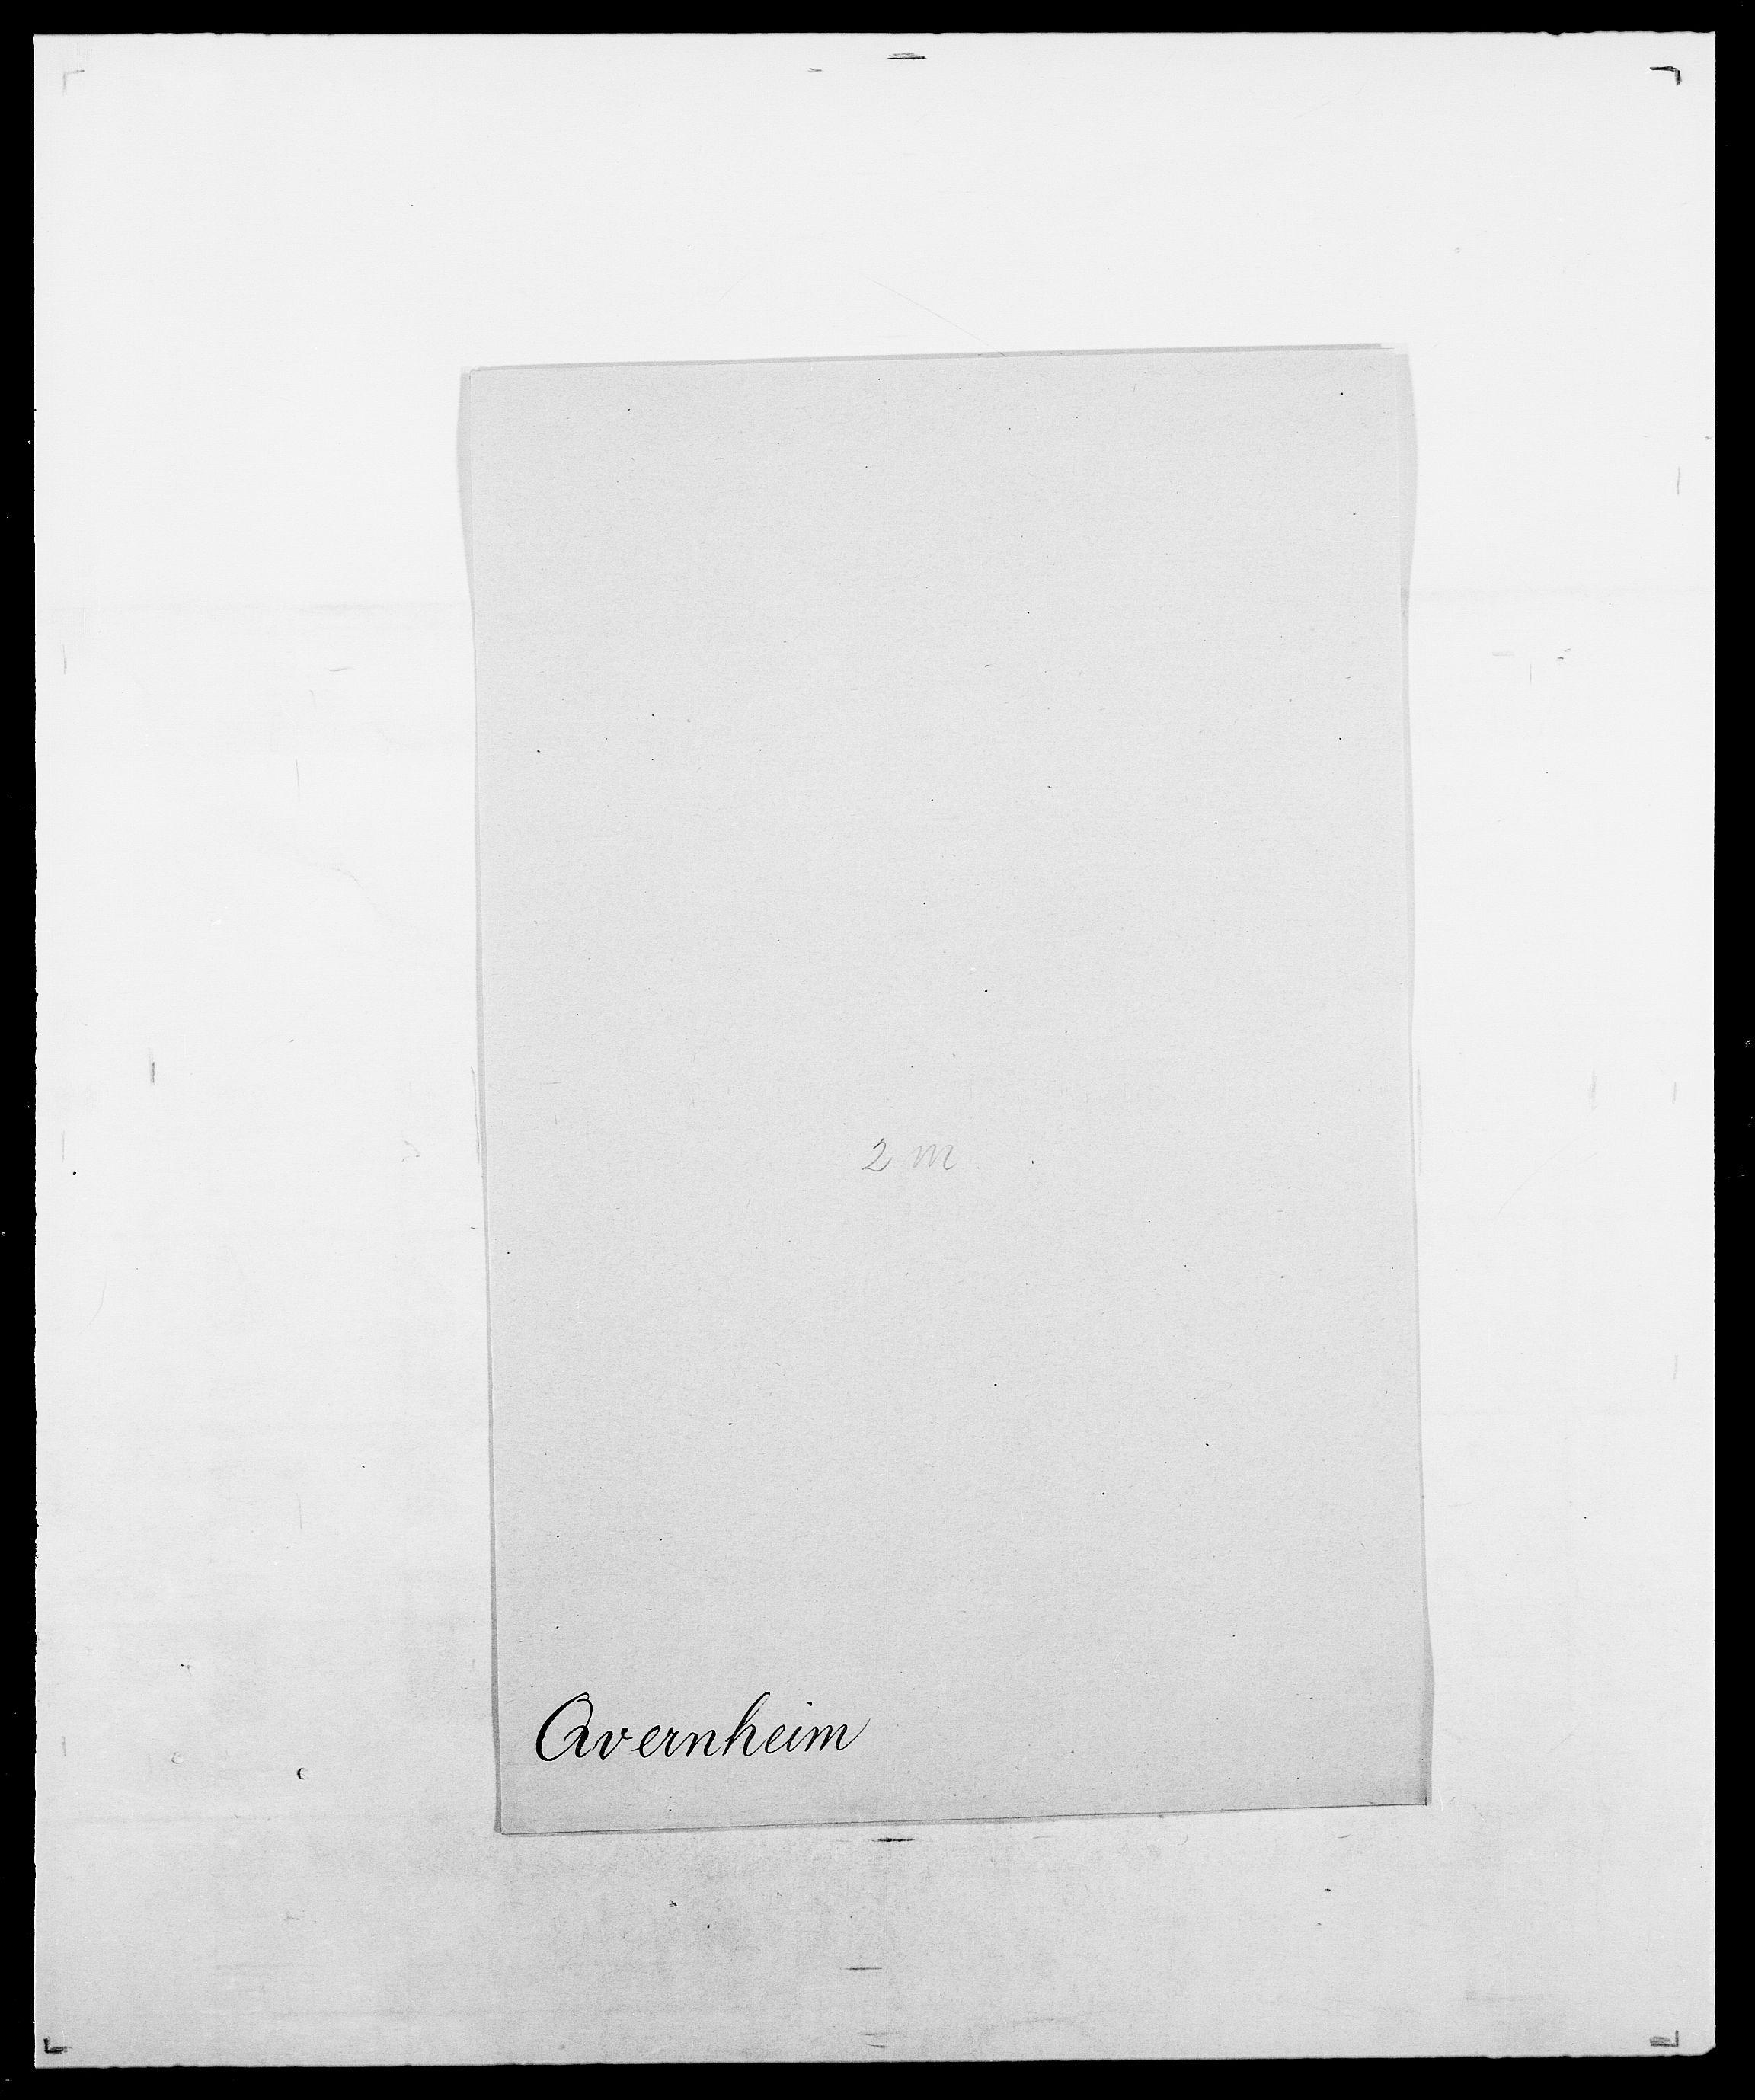 SAO, Delgobe, Charles Antoine - samling, D/Da/L0031: de Place - Raaum, s. 499